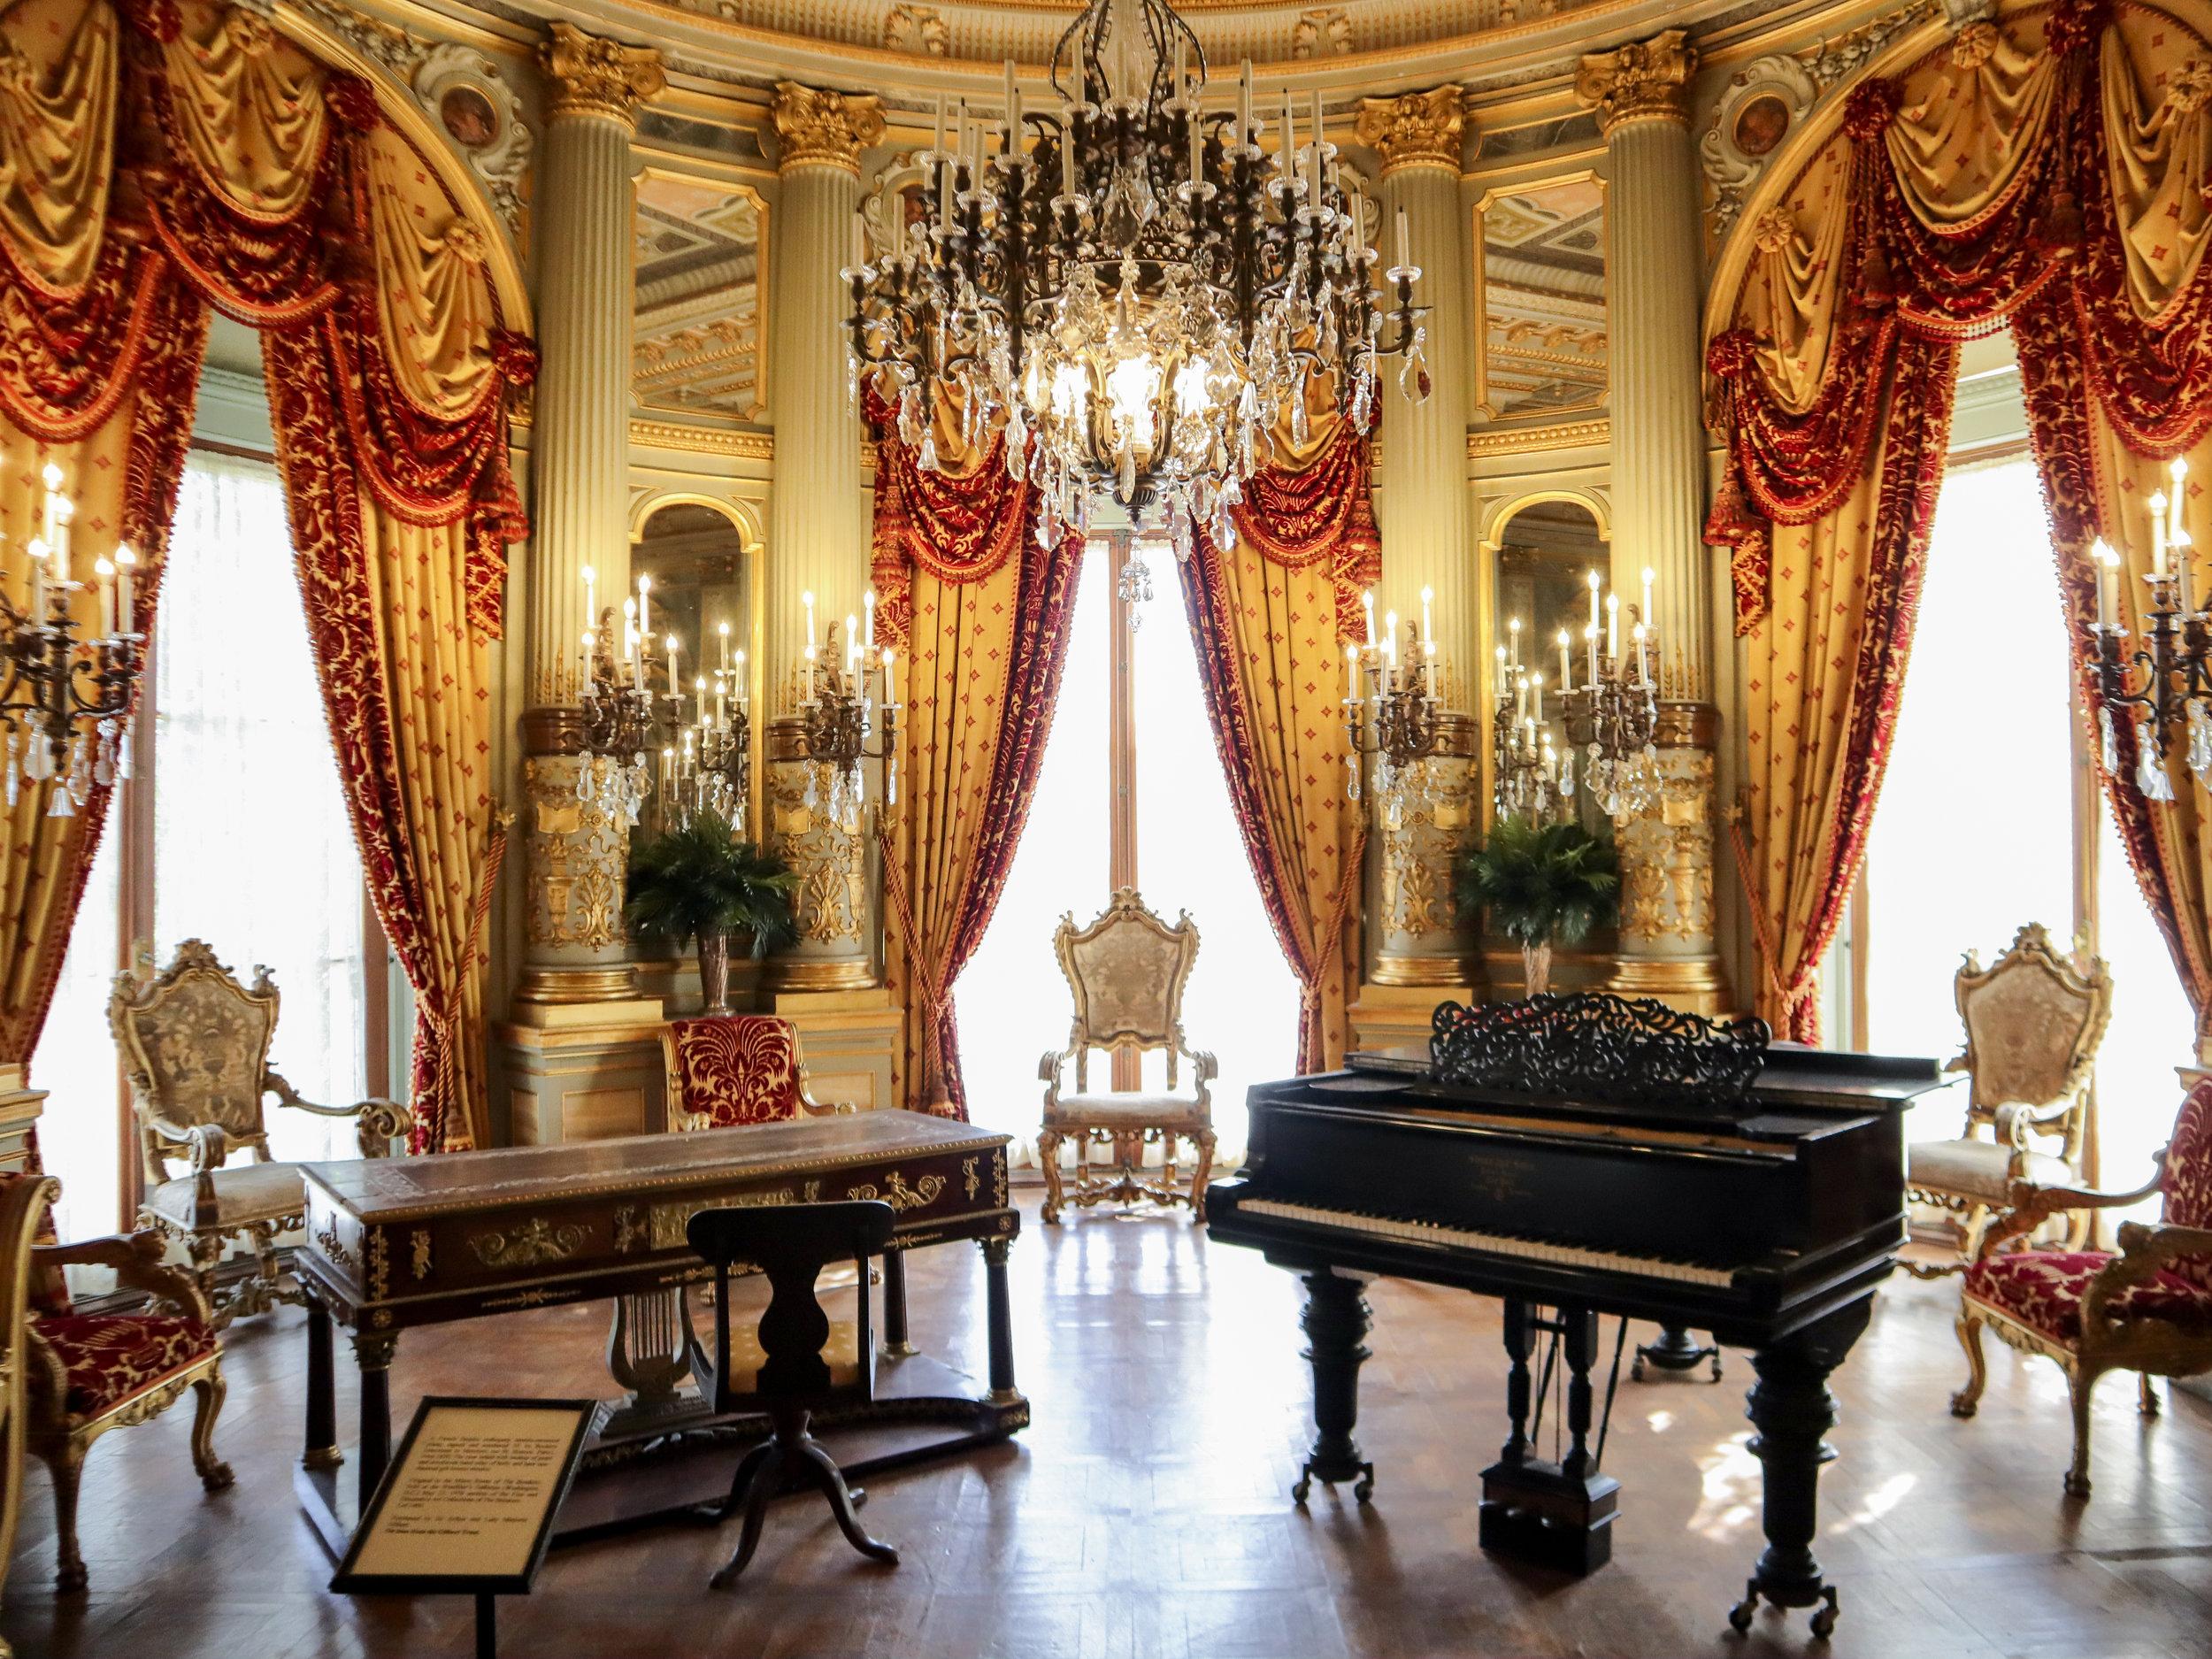 The breakers особняк изнутри пианино.jpg